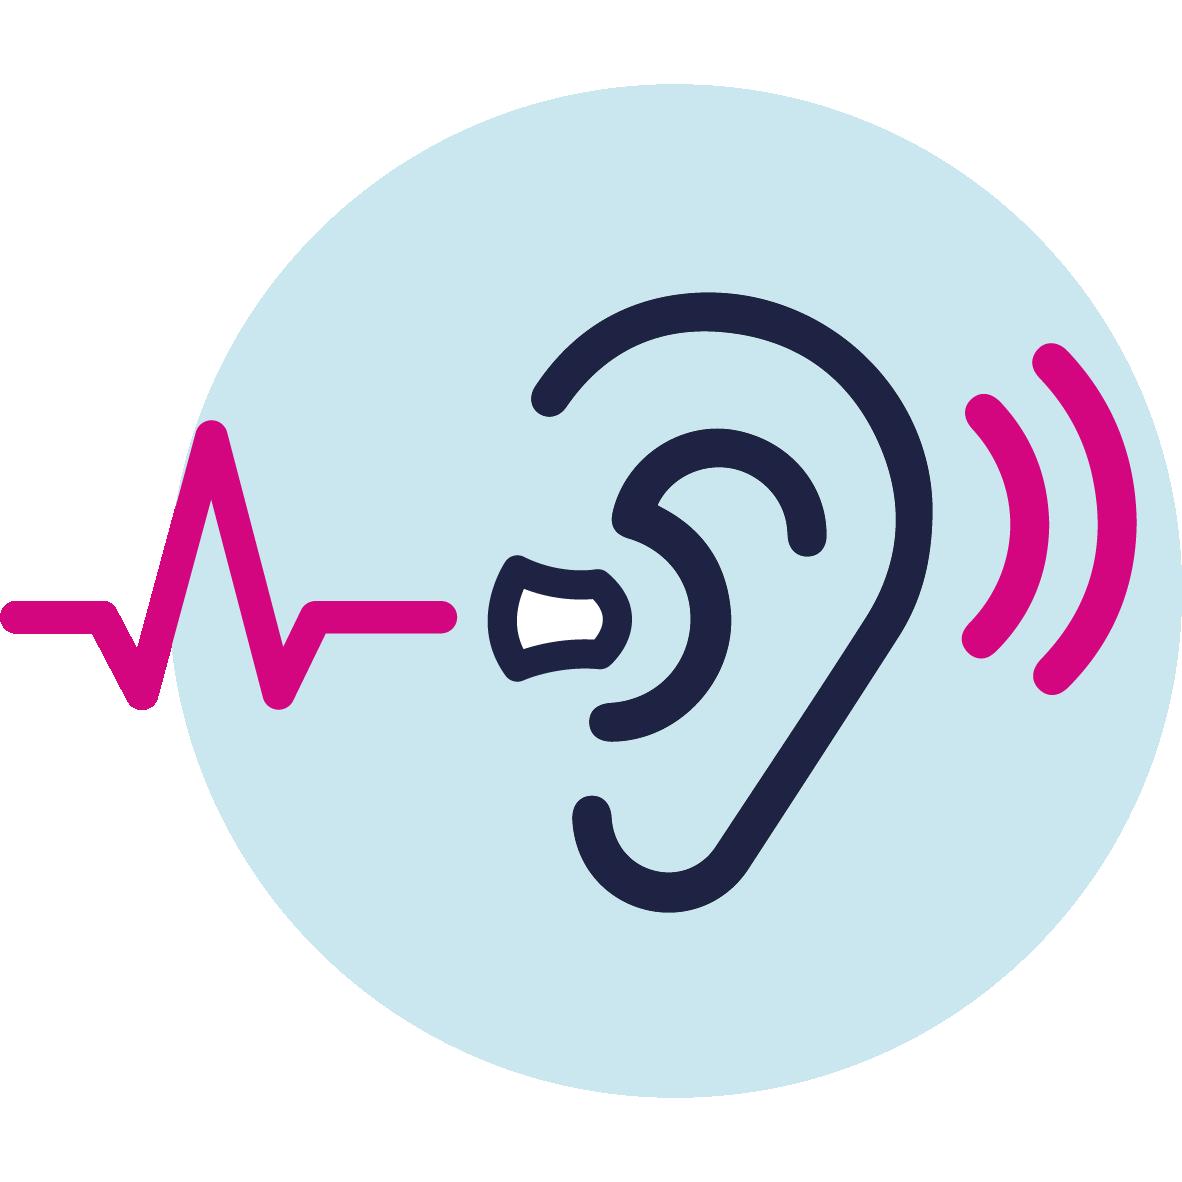 Dynamic hearing icon